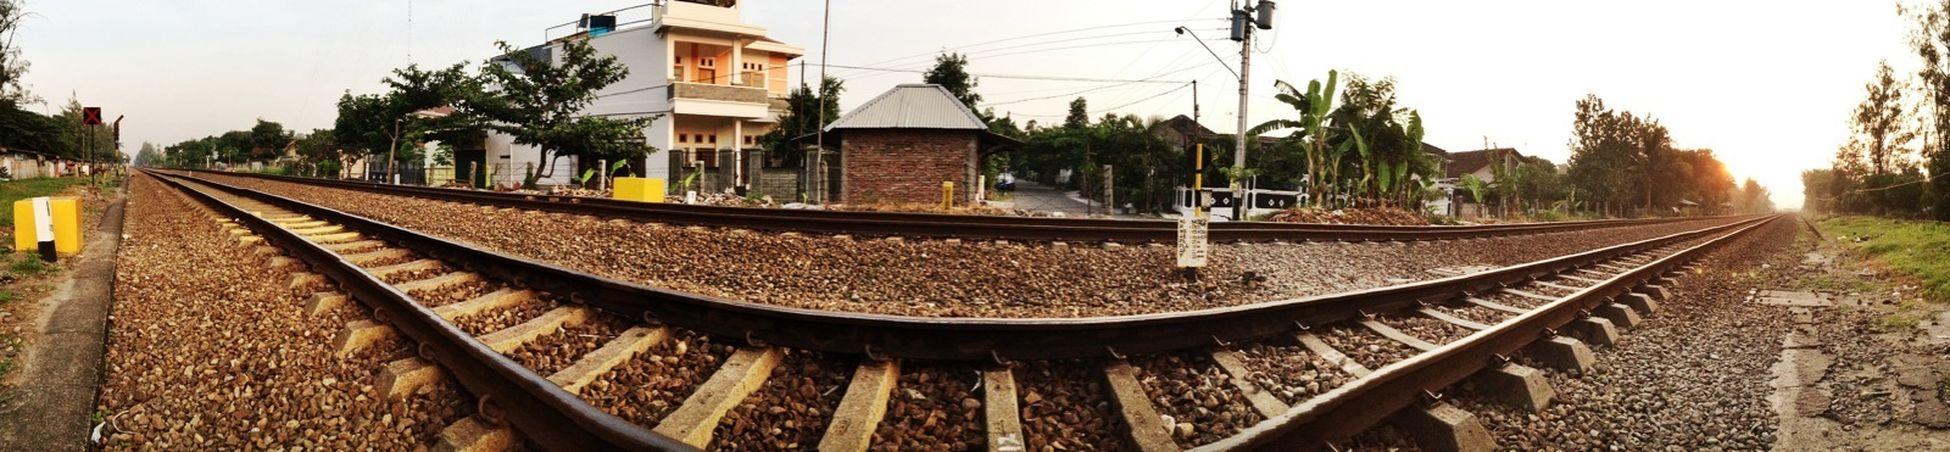 Rail way panorama. Railwah Surakarta Panorama